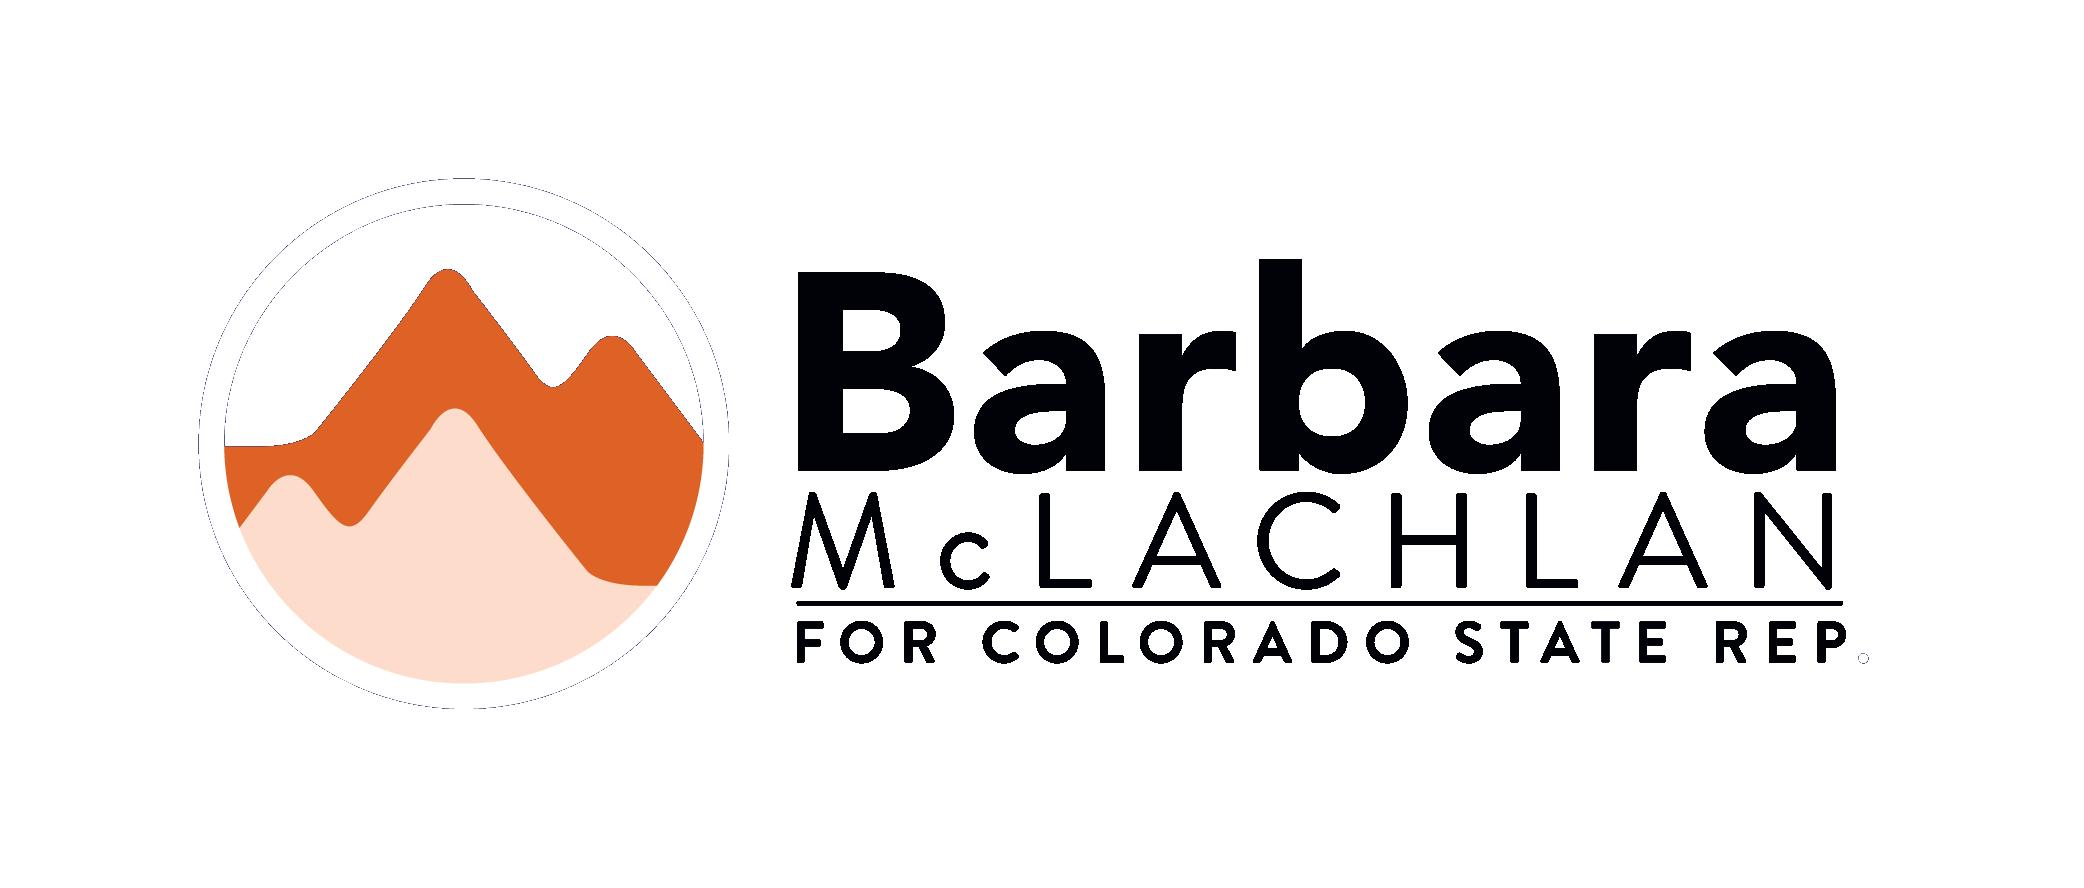 Barbara McLachlan